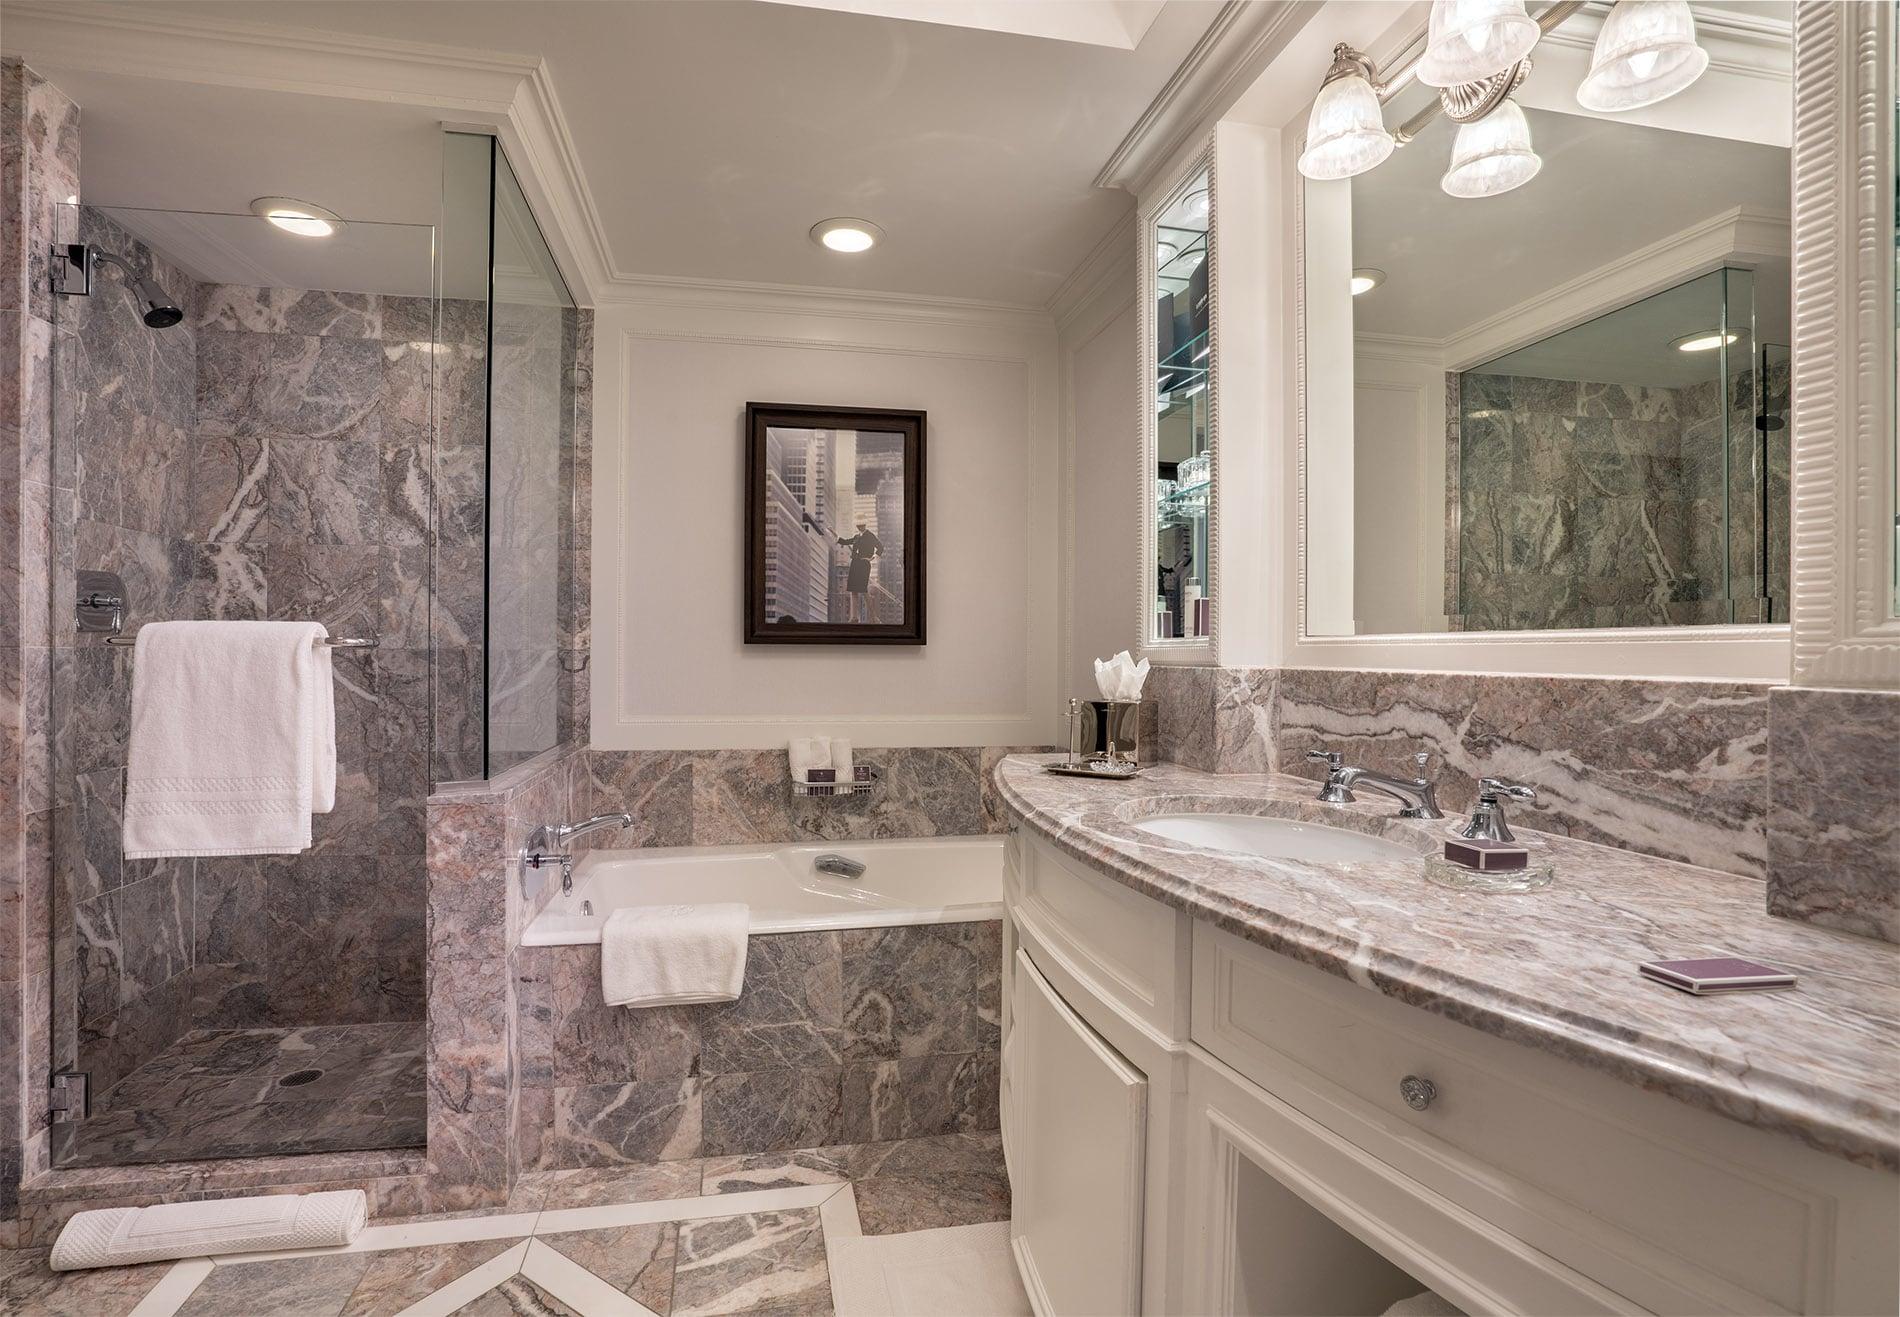 Ritz-Carlton New York Central Park, bathroom 2